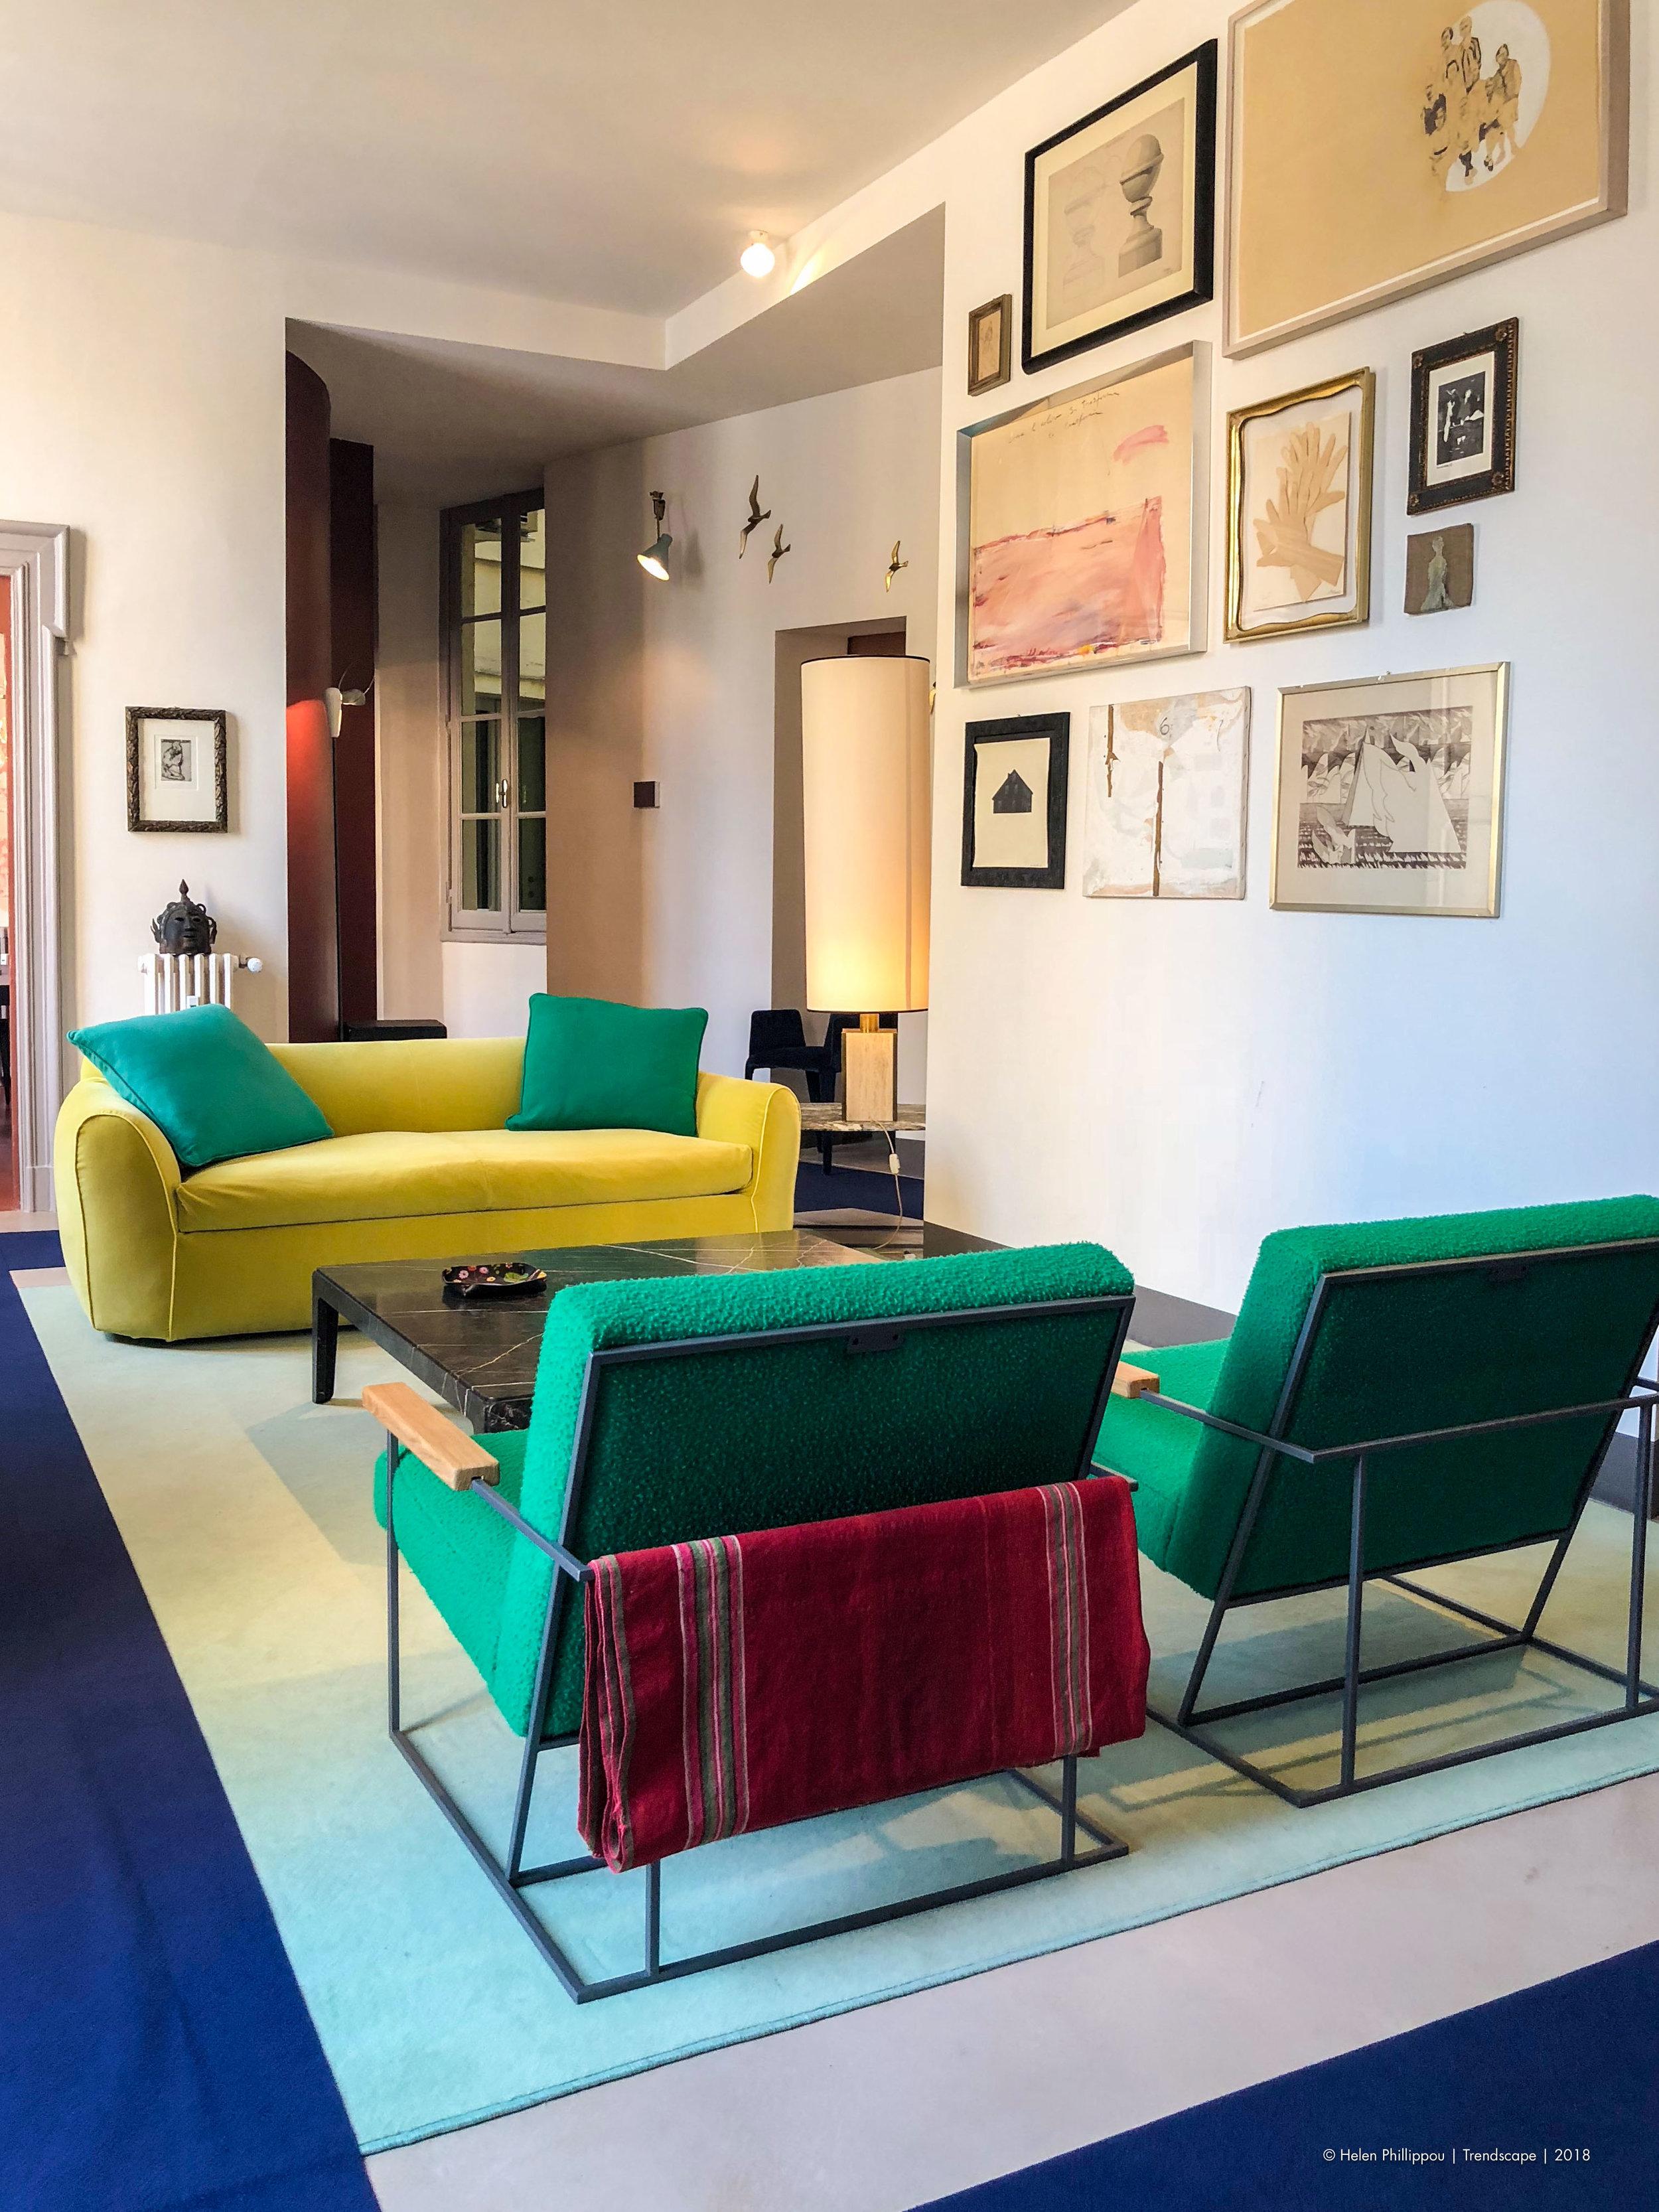 Giovanni Cagnato Milan Design Week 2018 3.jpg